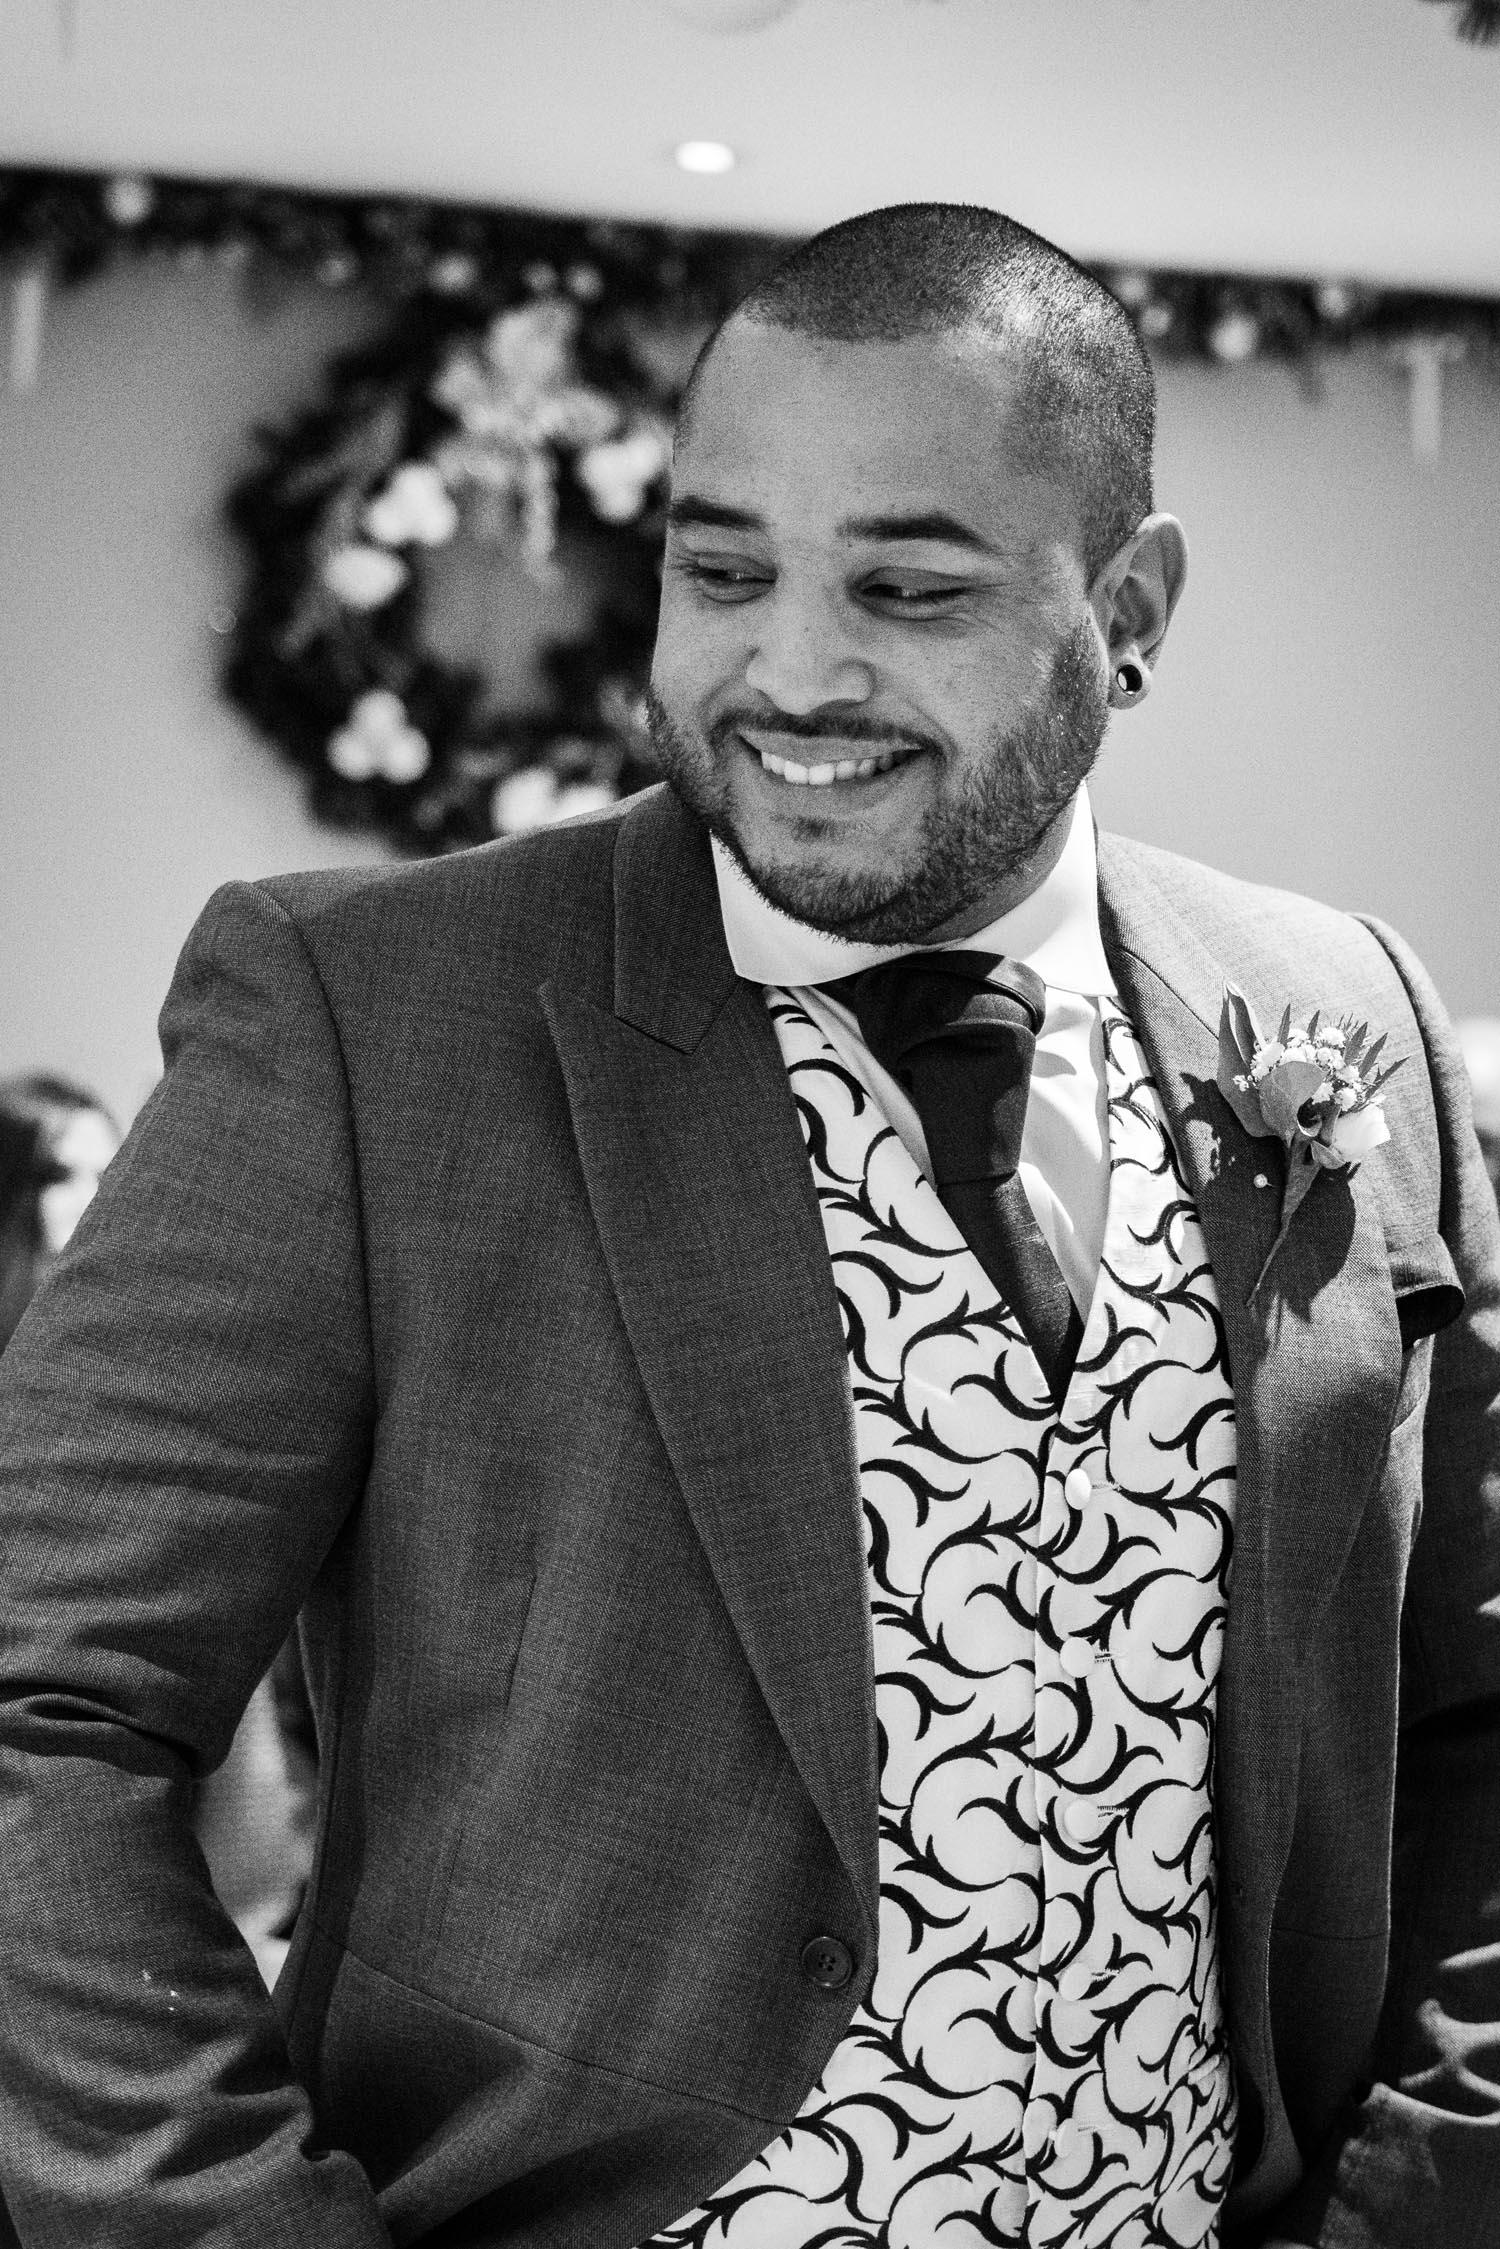 wedding-photos-ceremony-ye-olde-plough-house-essex-249.jpg